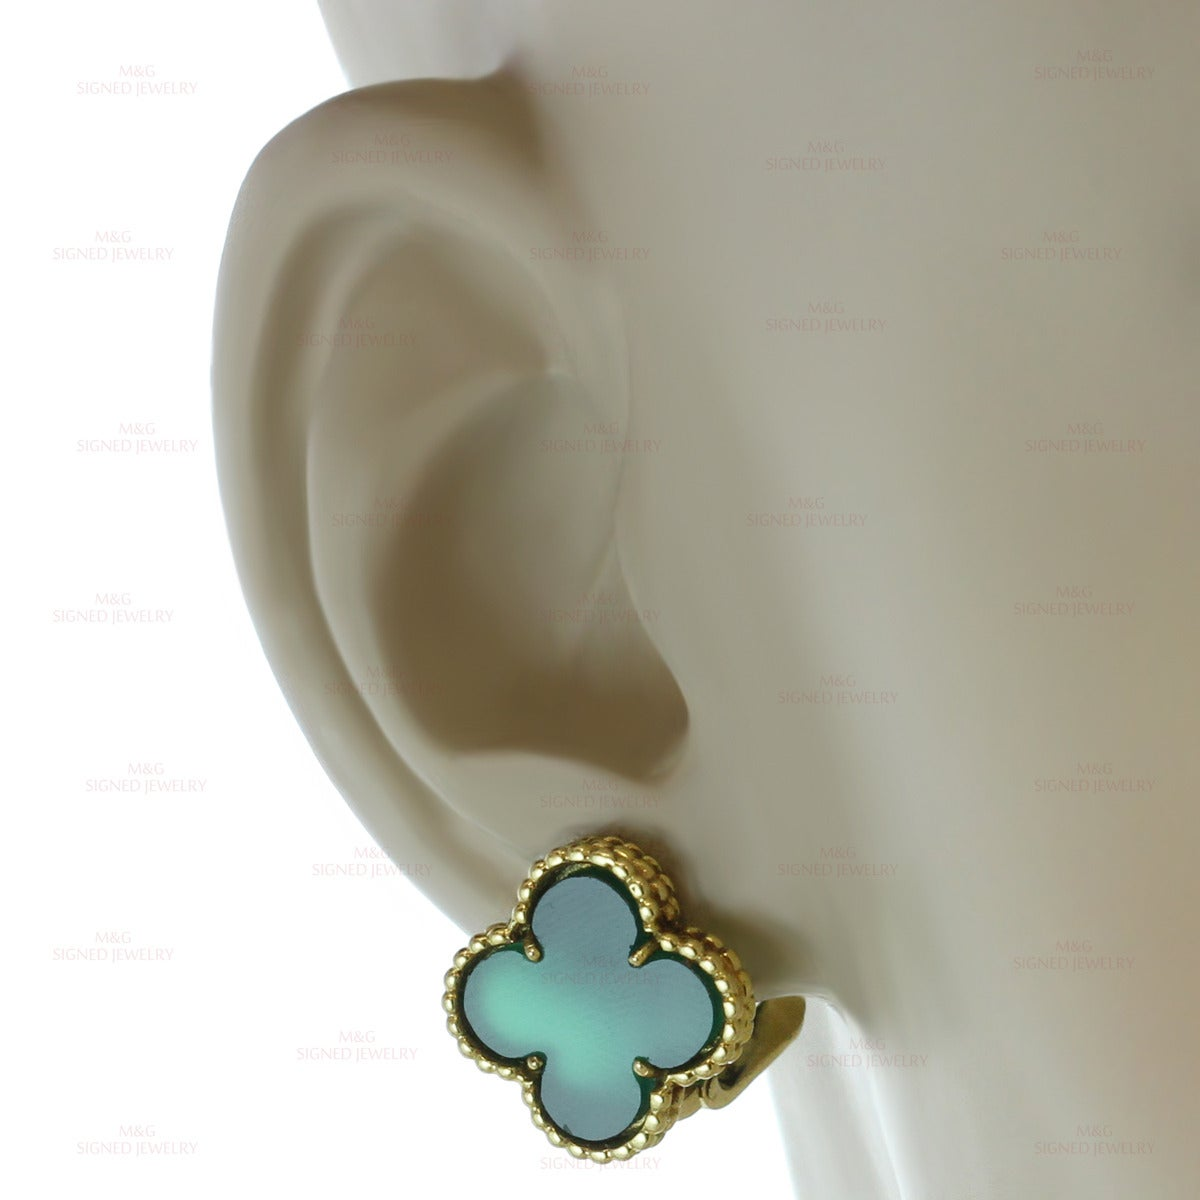 1970s Van Cleef & Arpels Alhambra Green Chalcedony Gold Earrings For Sale 1